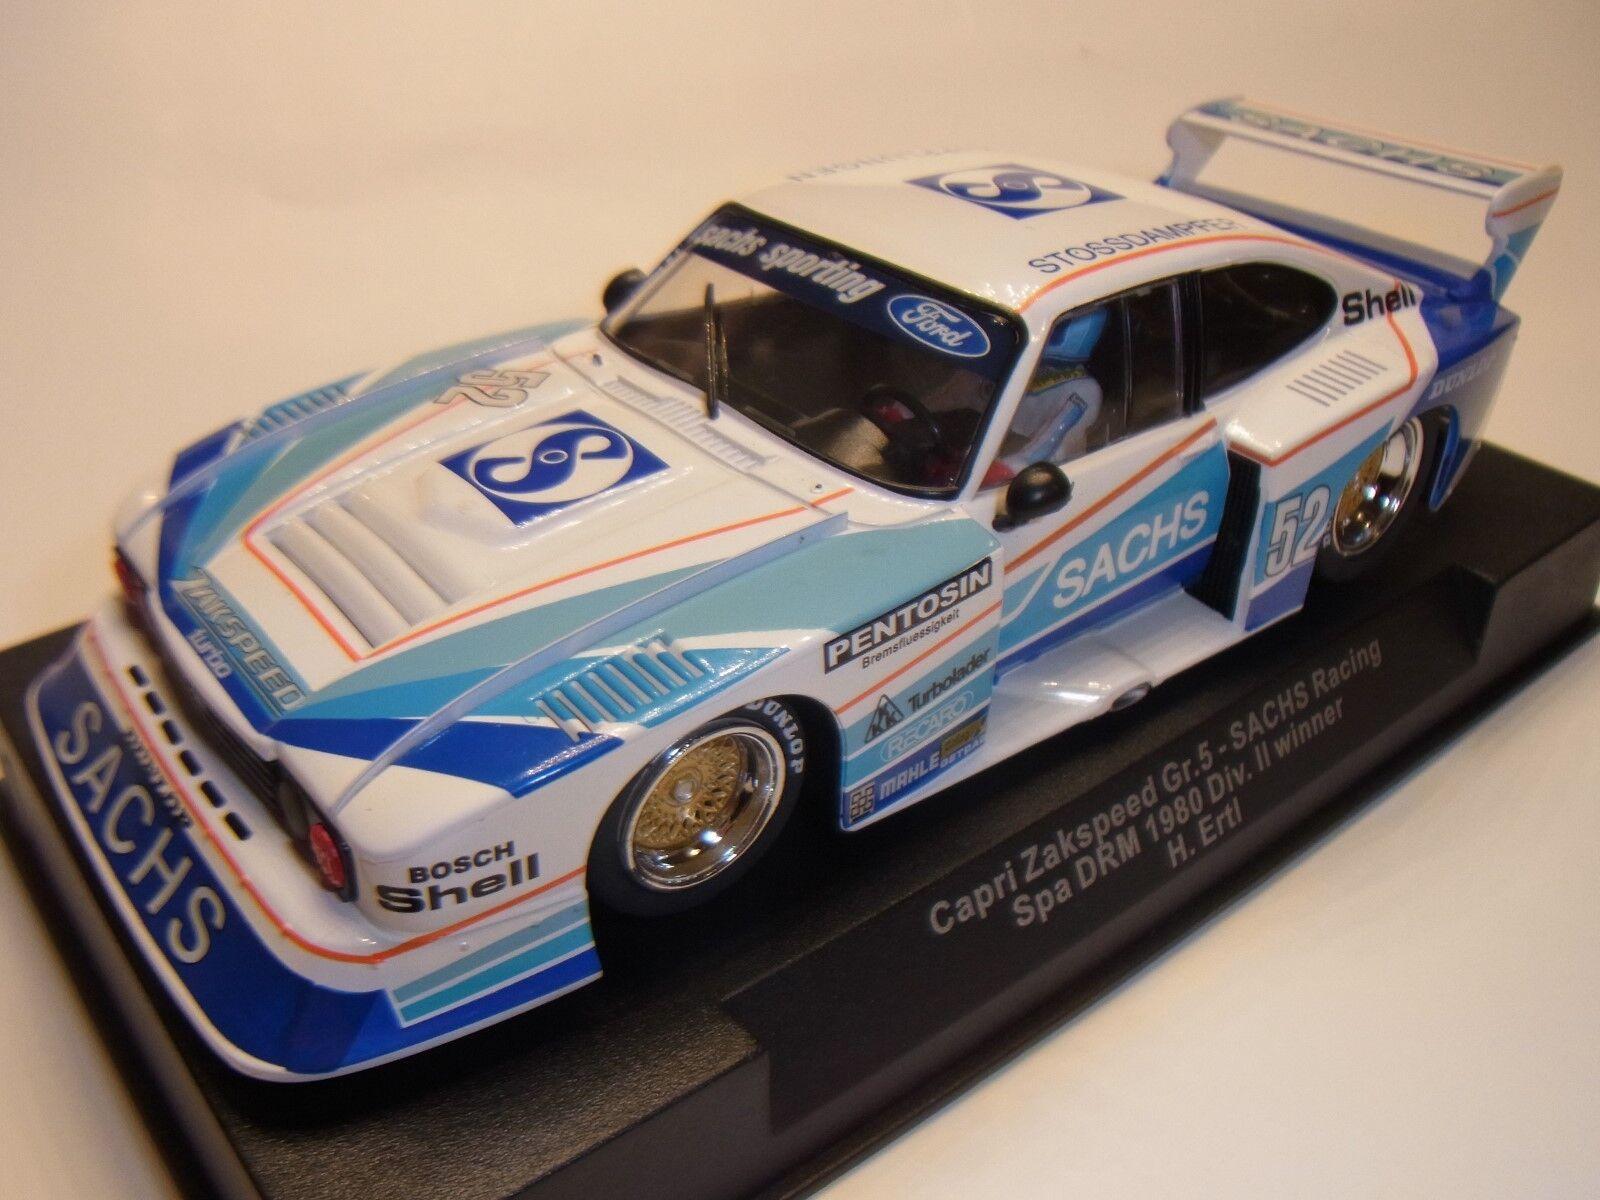 Sideways By Racer Ford Capri H.Ertl Gr.5 Spa  52 1980 SW36 Pista per Auto 1 3 2